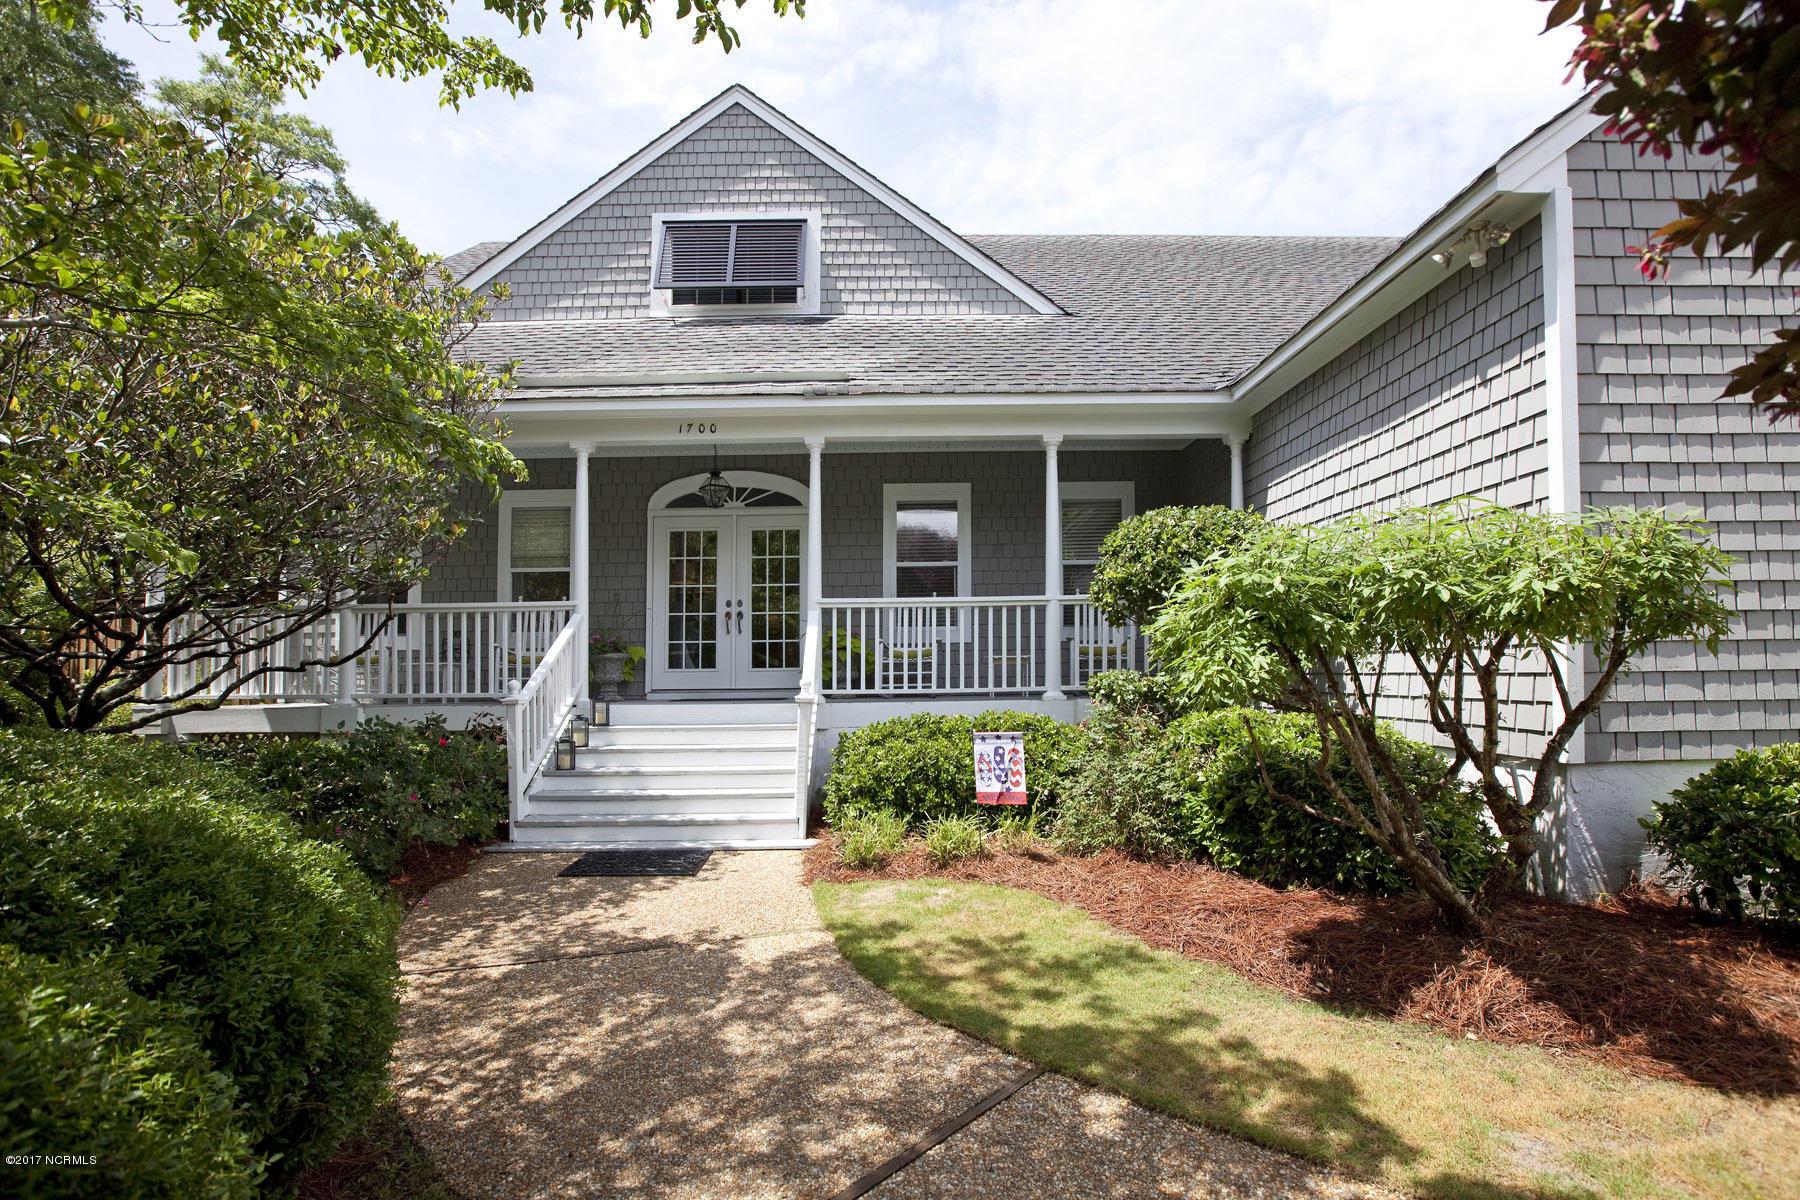 1700 Trey Court, Wilmington, North Carolina 28403, 5 Bedrooms Bedrooms, 13 Rooms Rooms,4 BathroomsBathrooms,Residential,For Sale,Trey,100064587